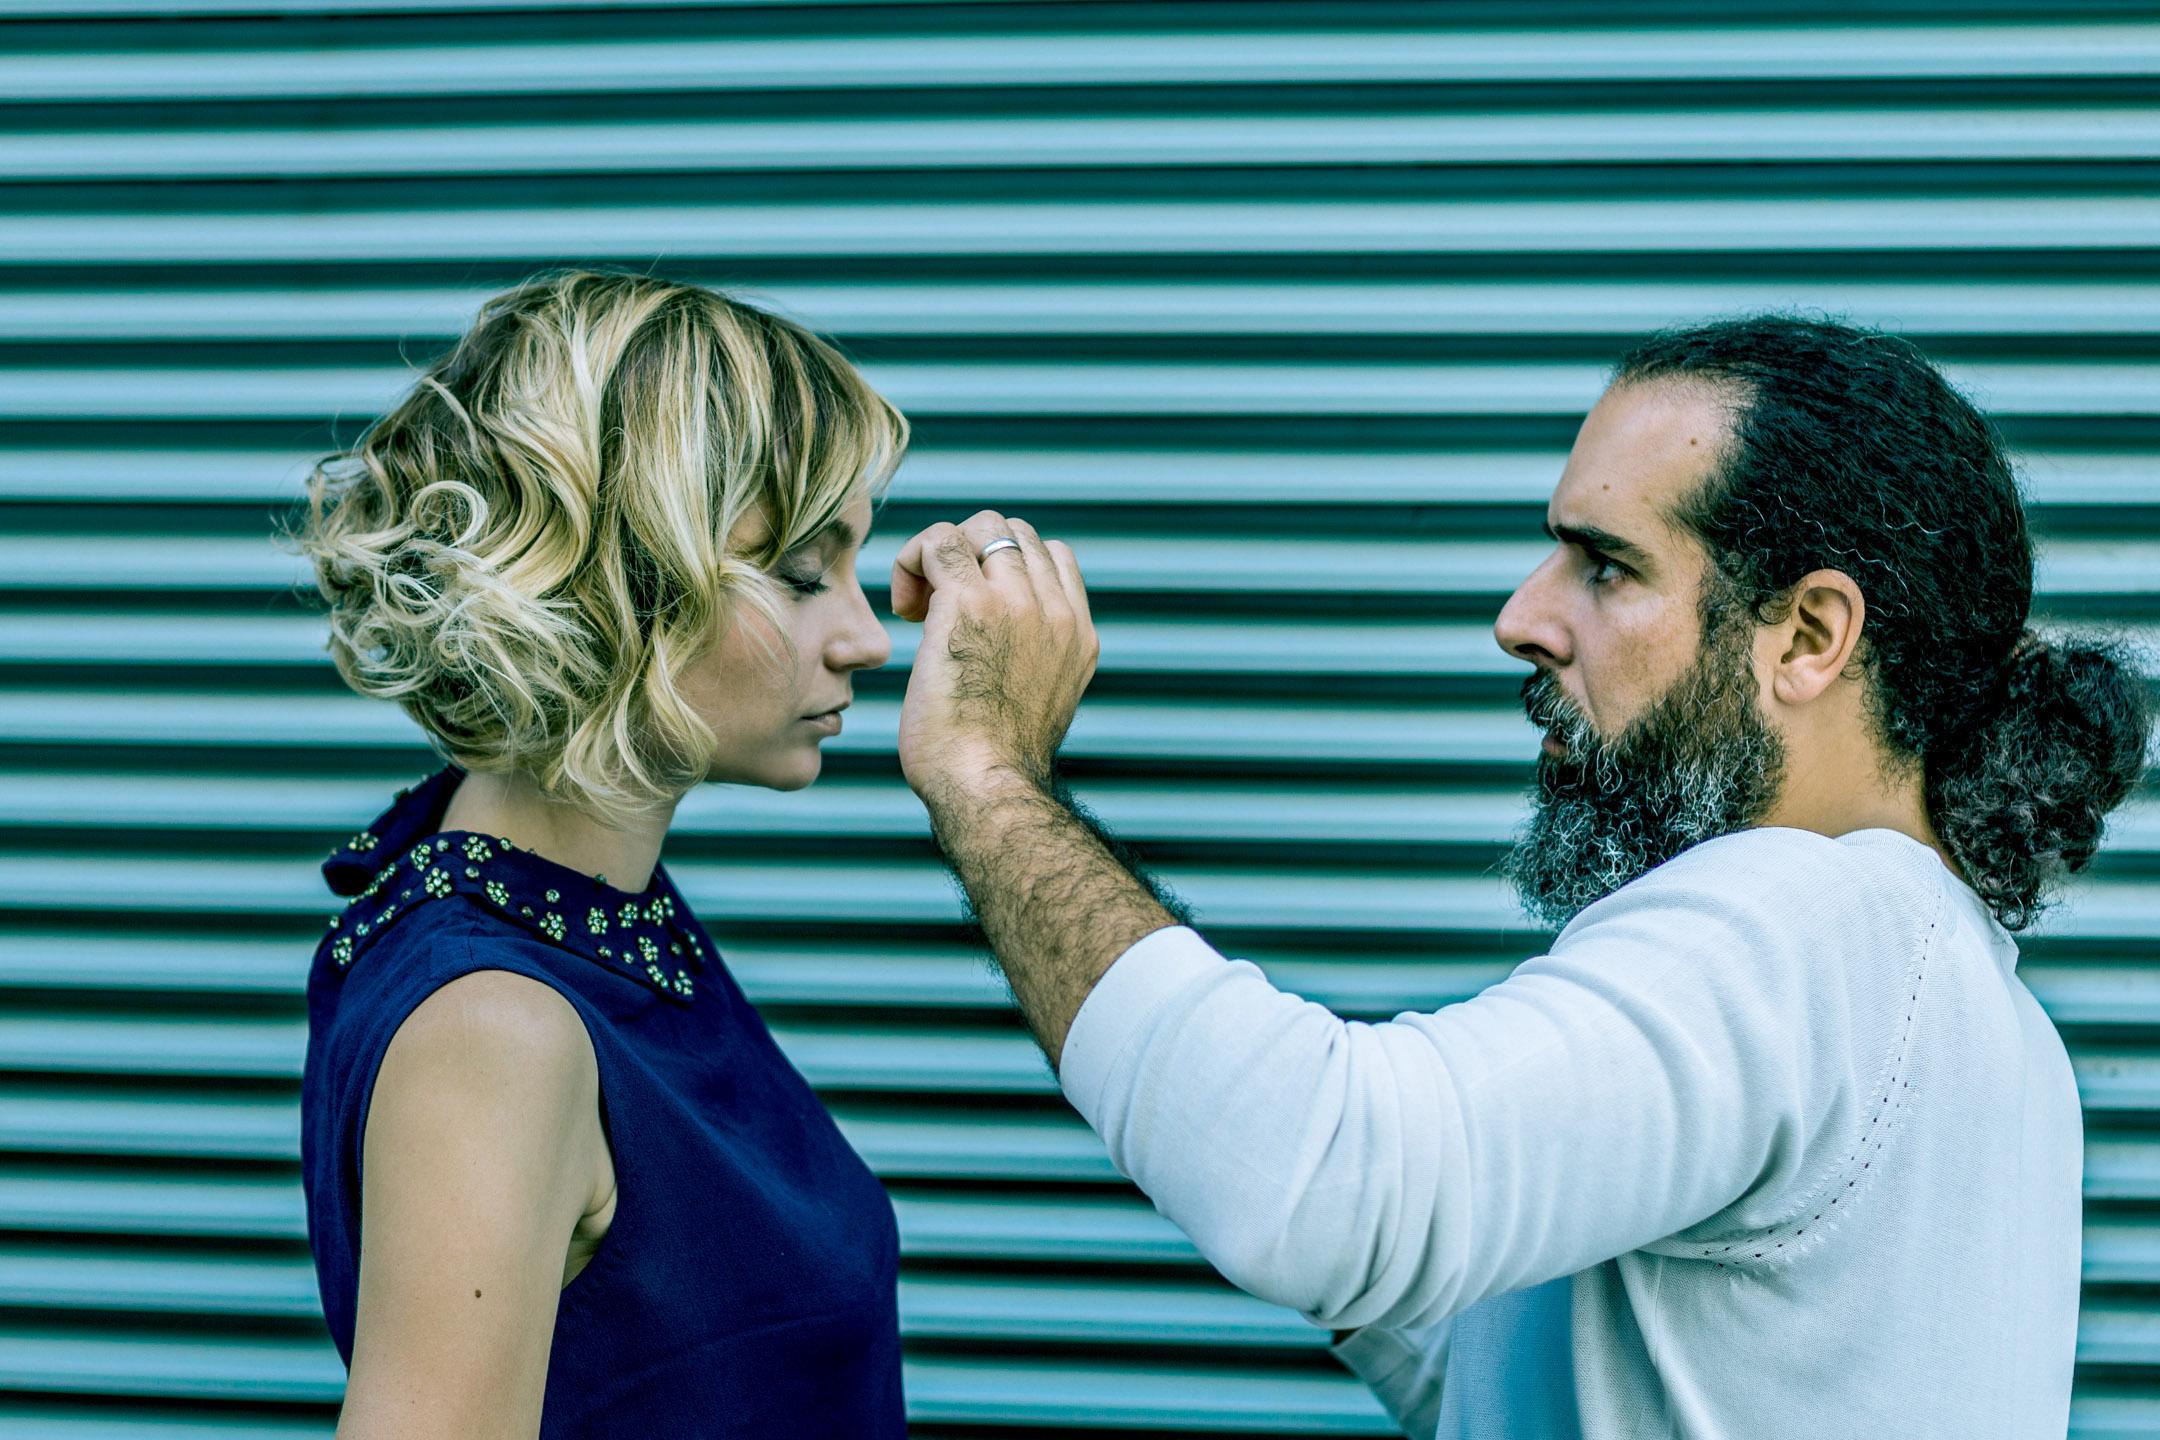 Issone bon salon de coiffure lyon blog mode lyon for Salon de coiffure afro lyon